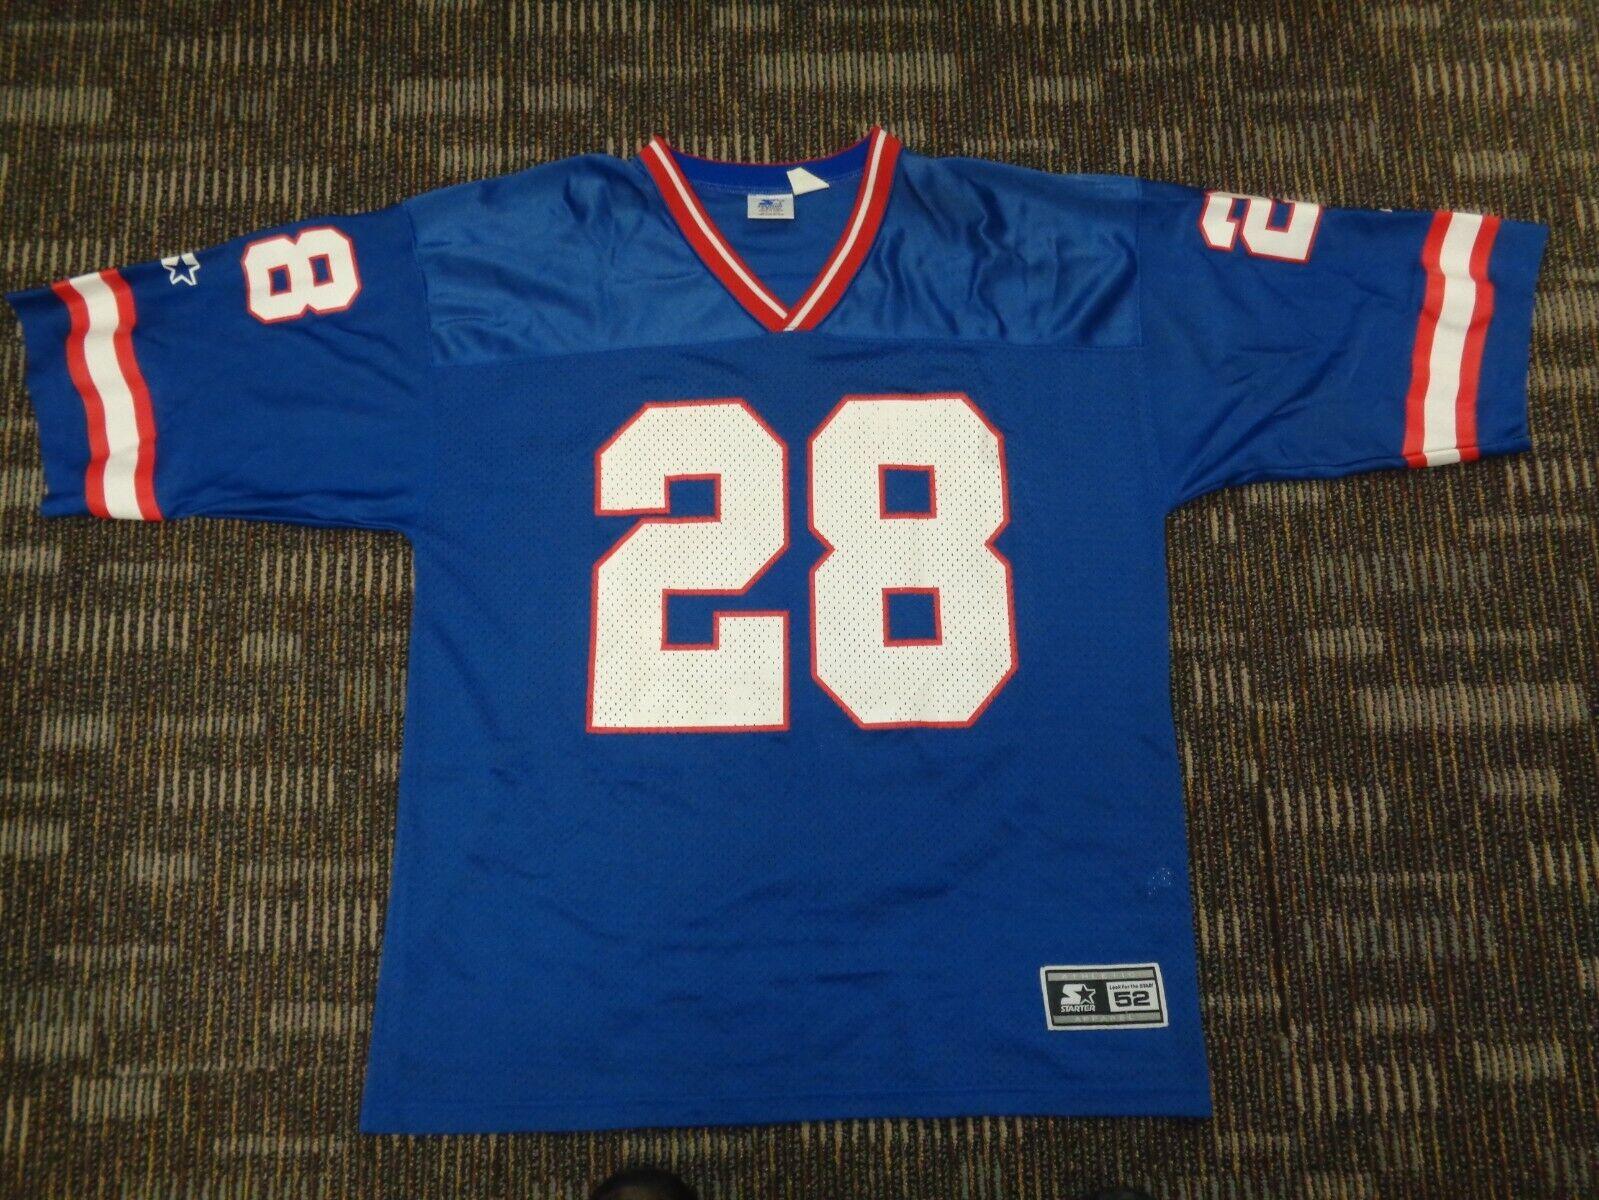 NWOT TYRONE WHEATLEY 28 NY NEW YORK GIANTS STARTER NFL GAME FOOTBALL JERSEY XL - $29.99